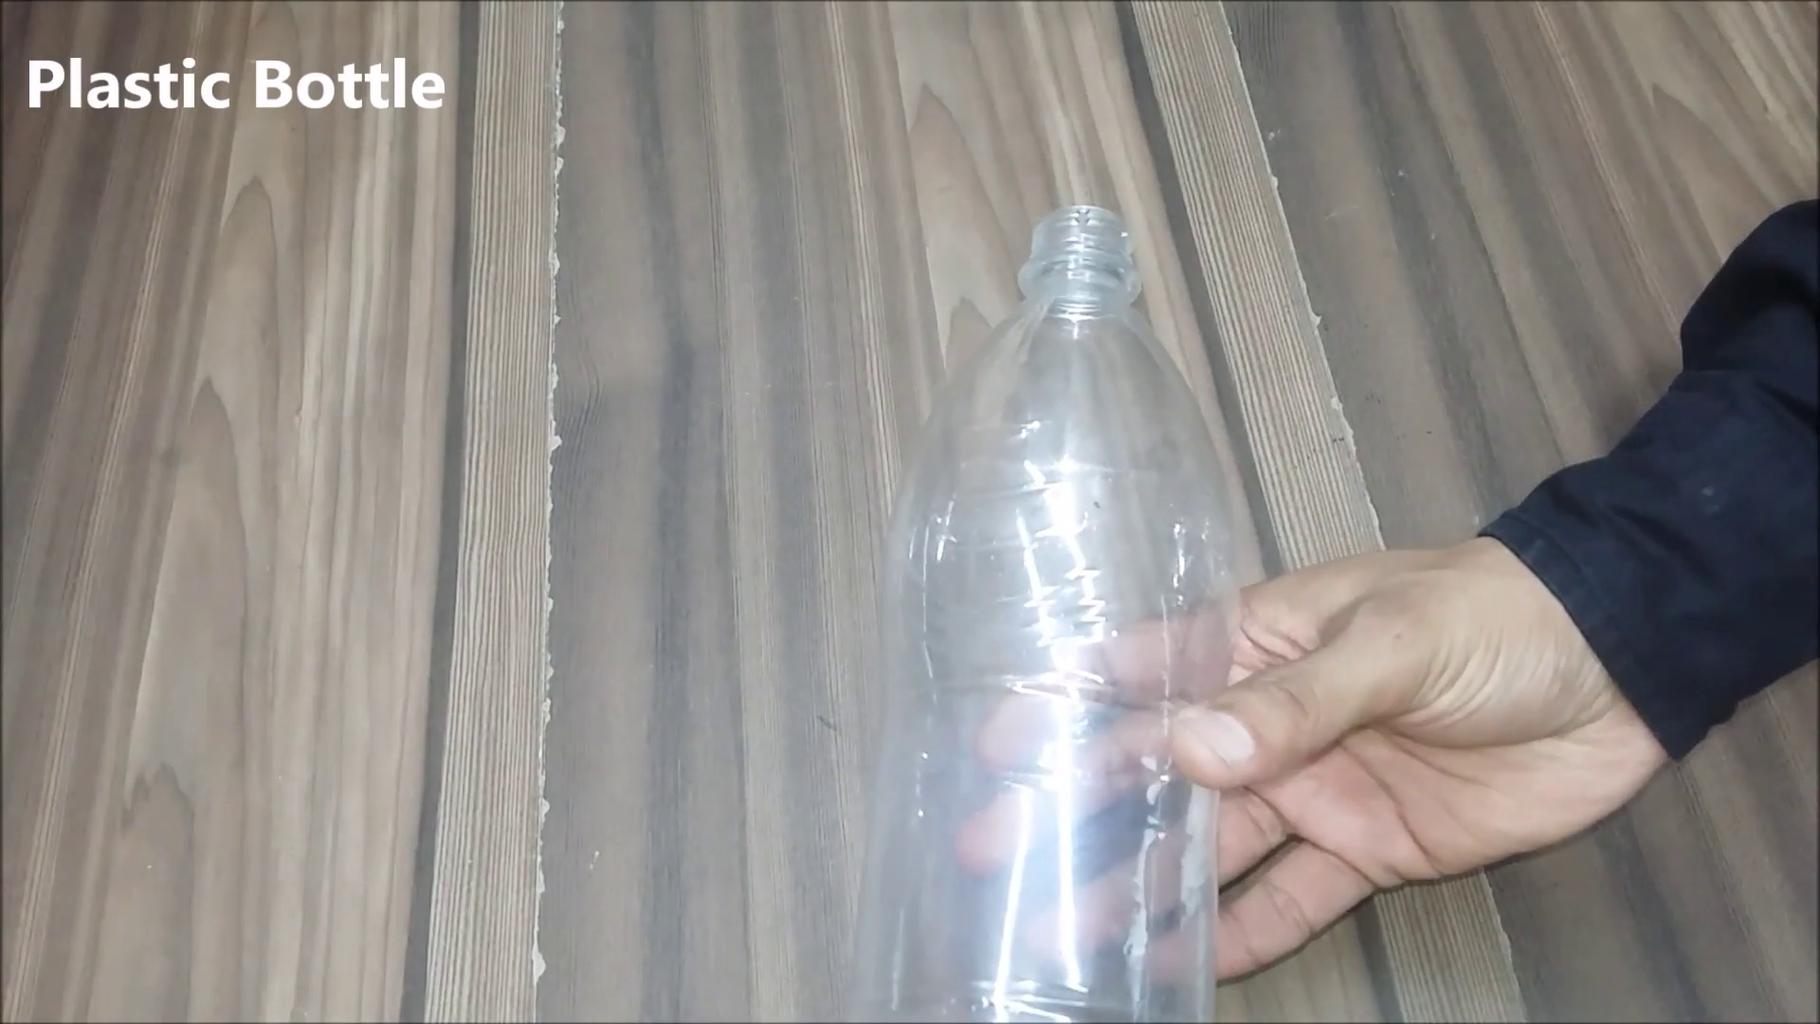 Use of Plastic Bottle